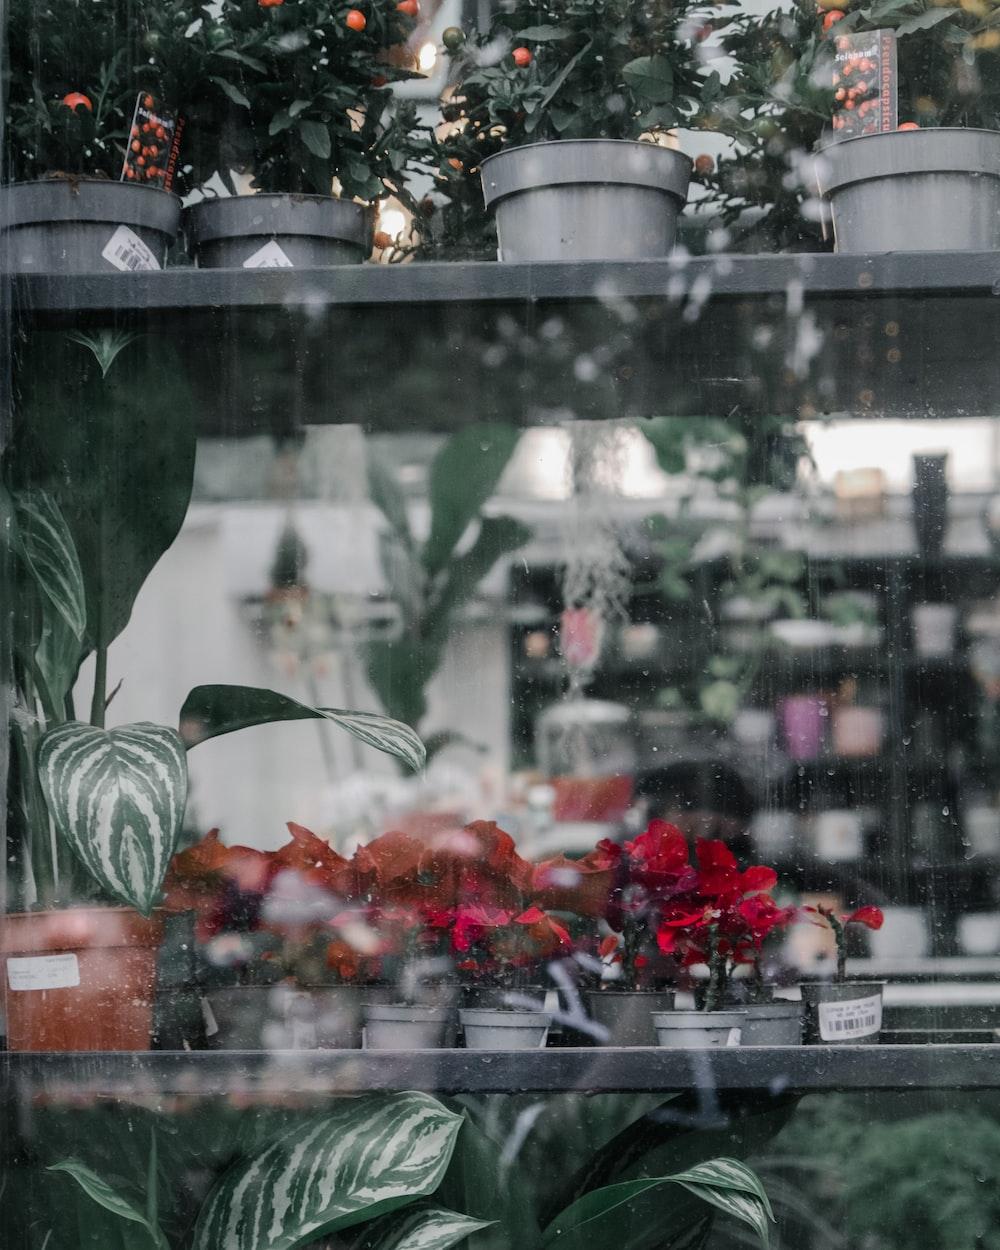 red flowers in clear glass window